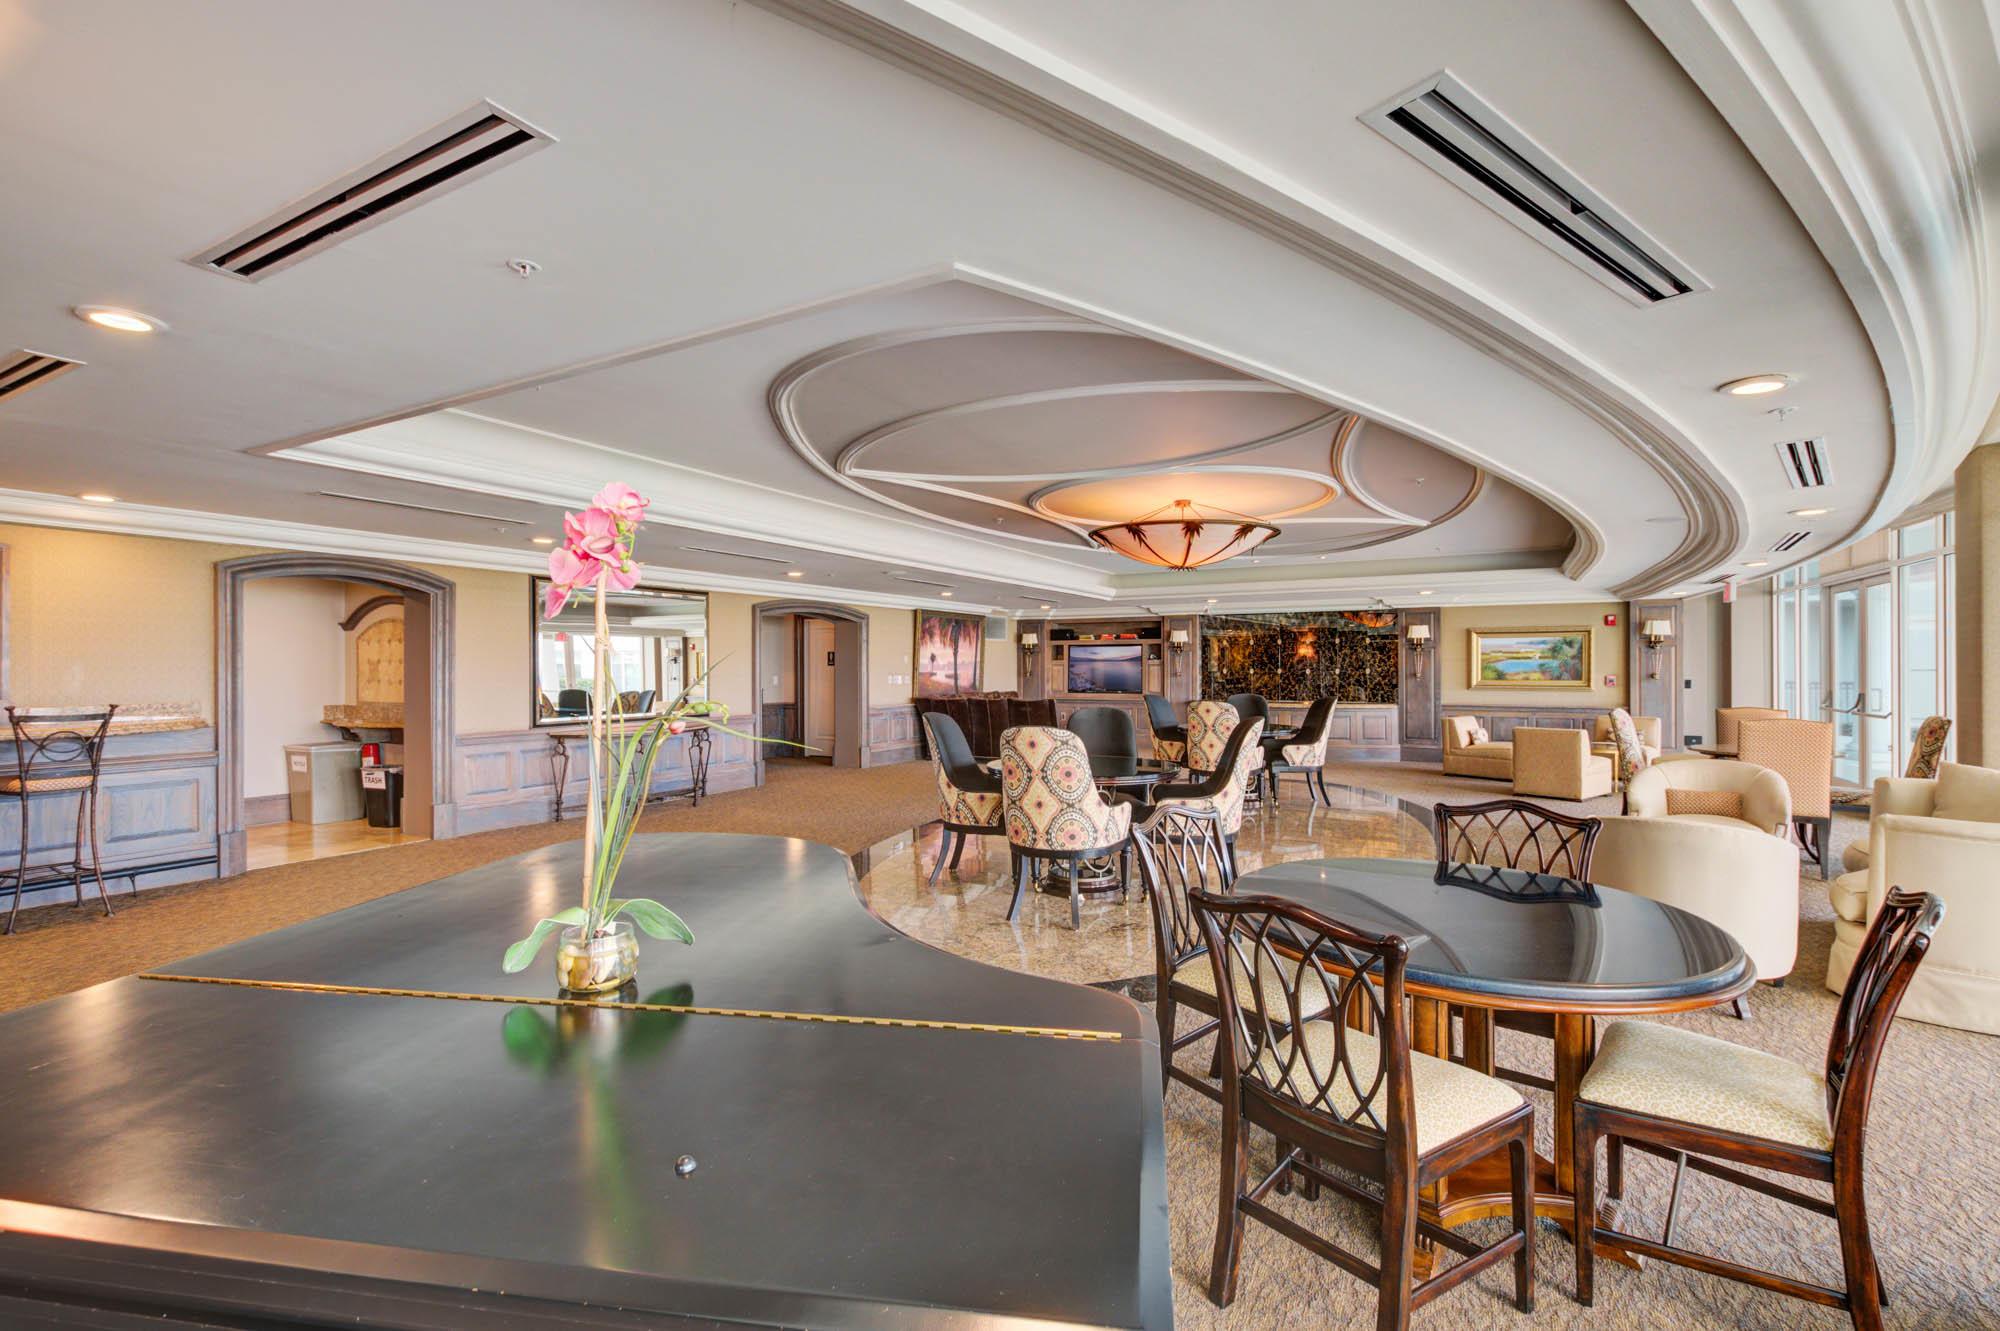 Renaissance On Chas Harbor Homes For Sale - 231 Plaza, Mount Pleasant, SC - 11